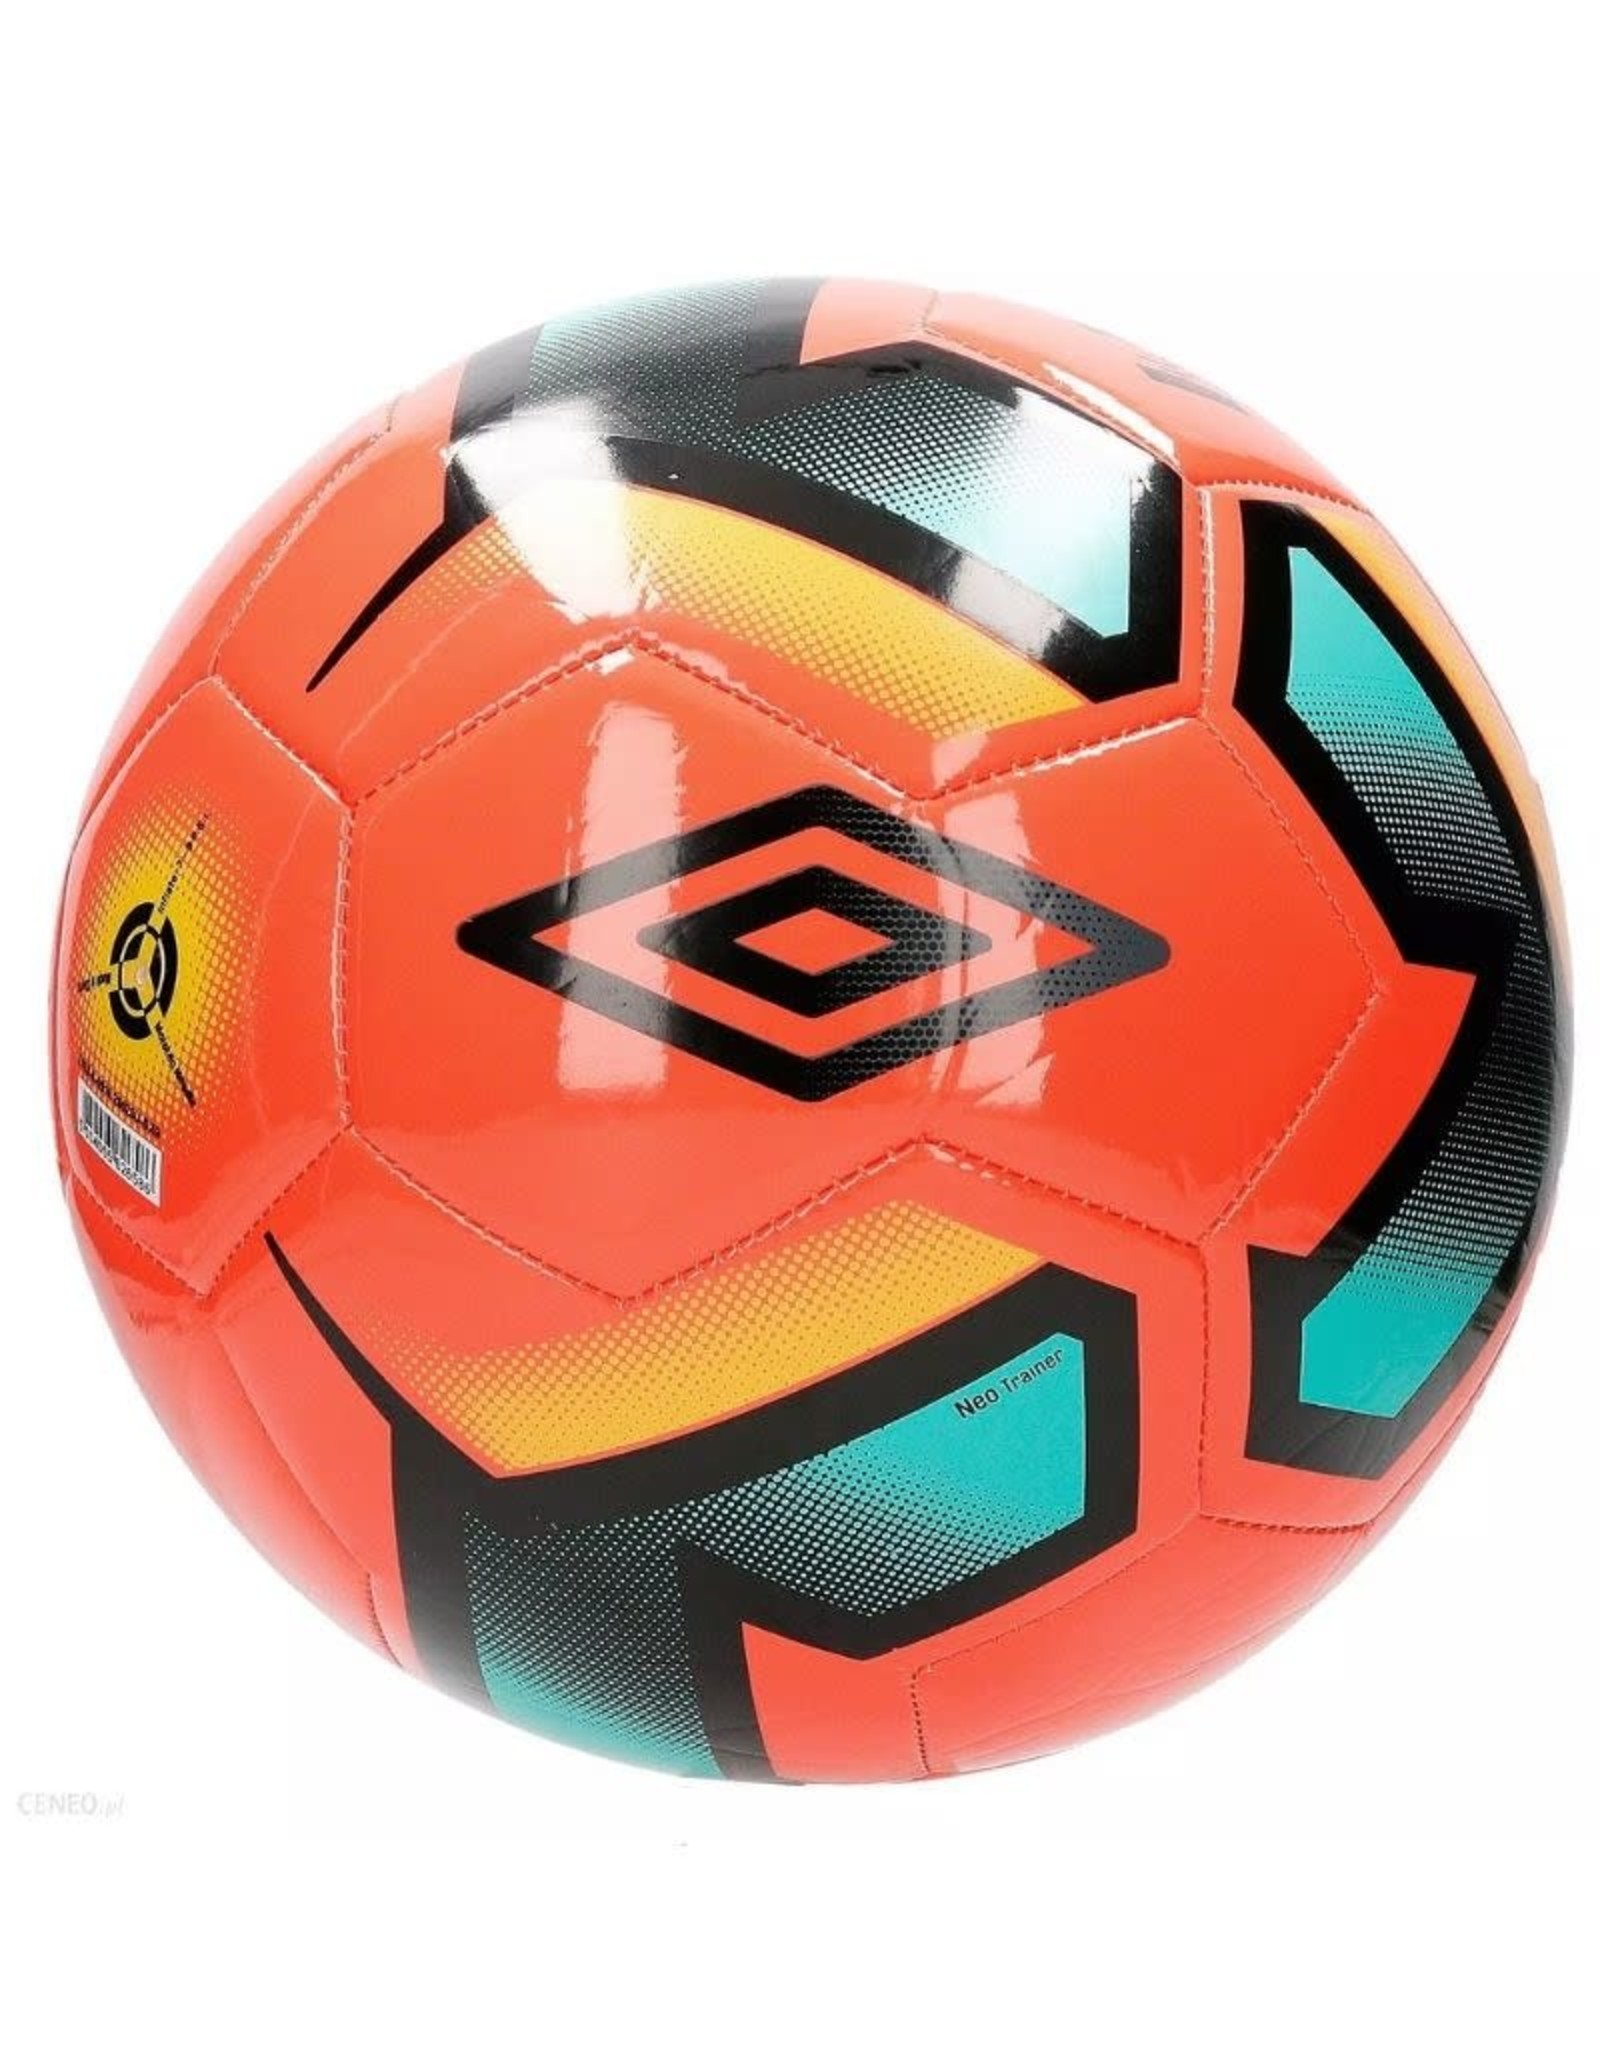 Umbro Neo Trainer Soccer Ball Size 5